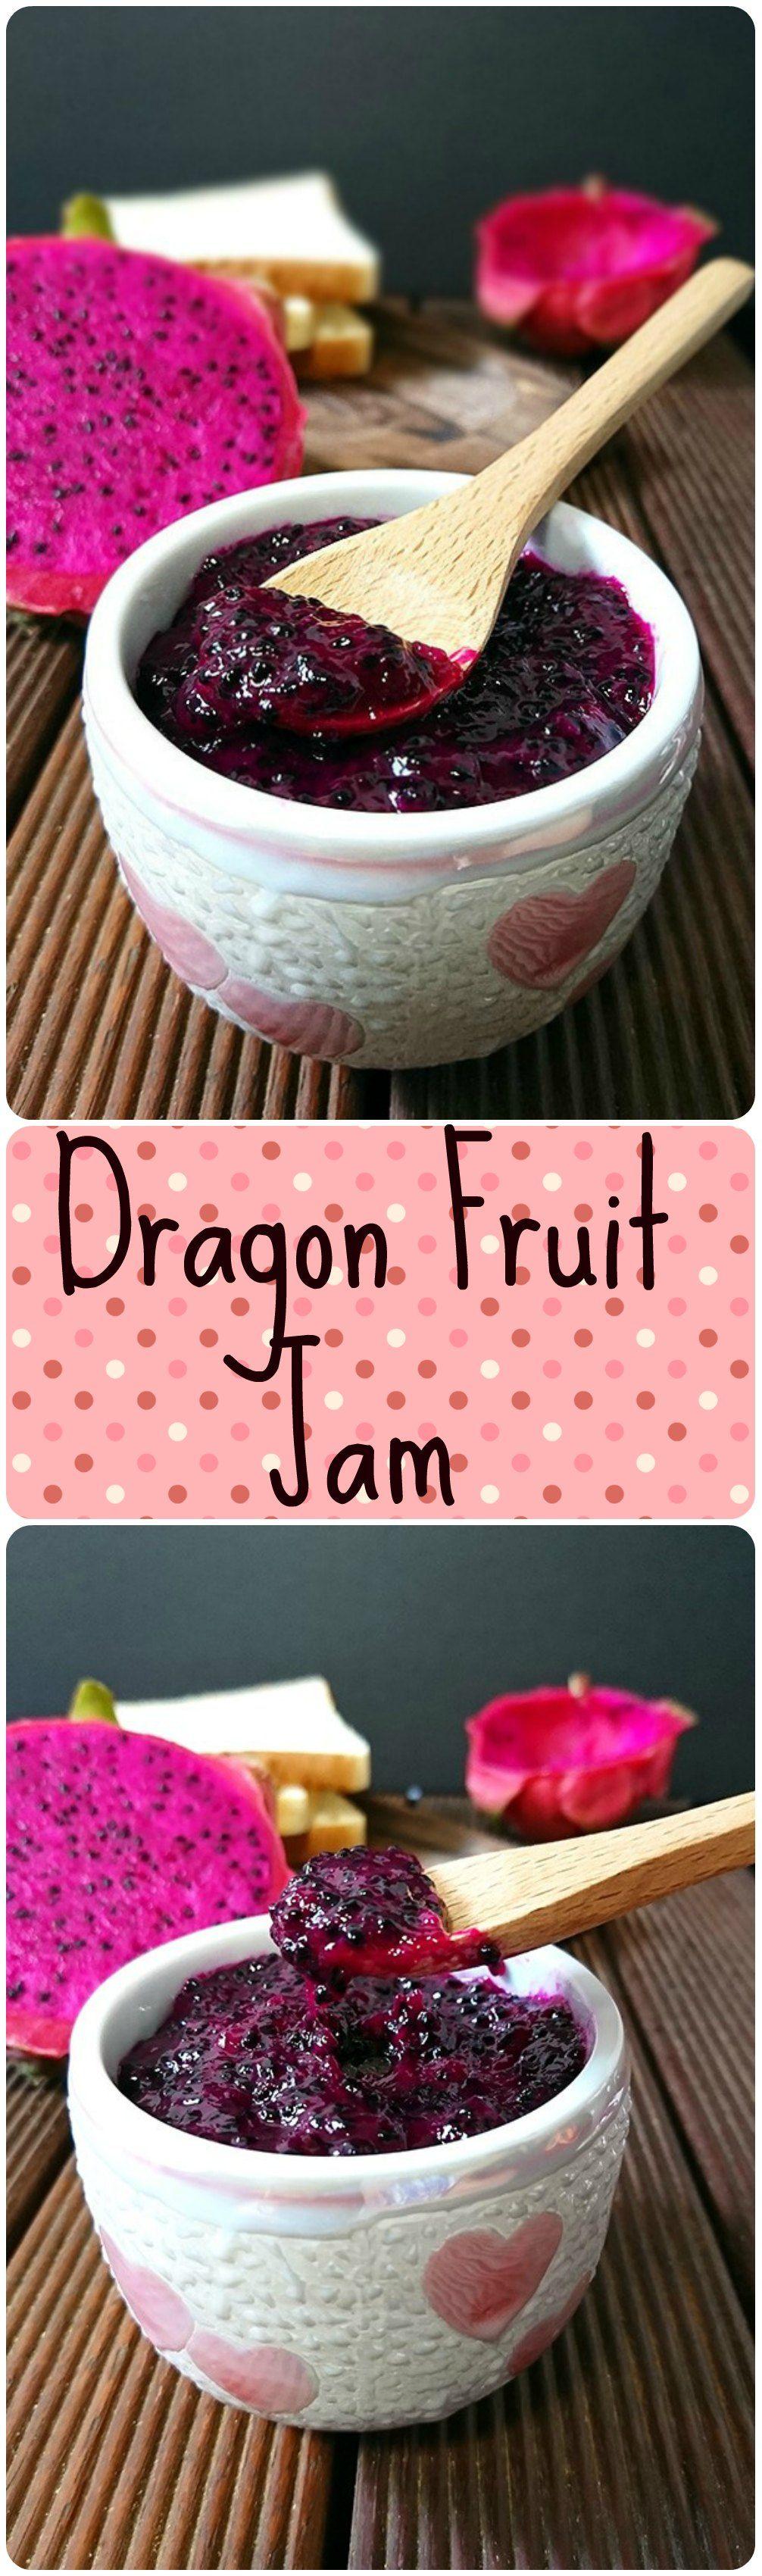 Dragon fruit jam recipe in 2019 vegetarian recipes